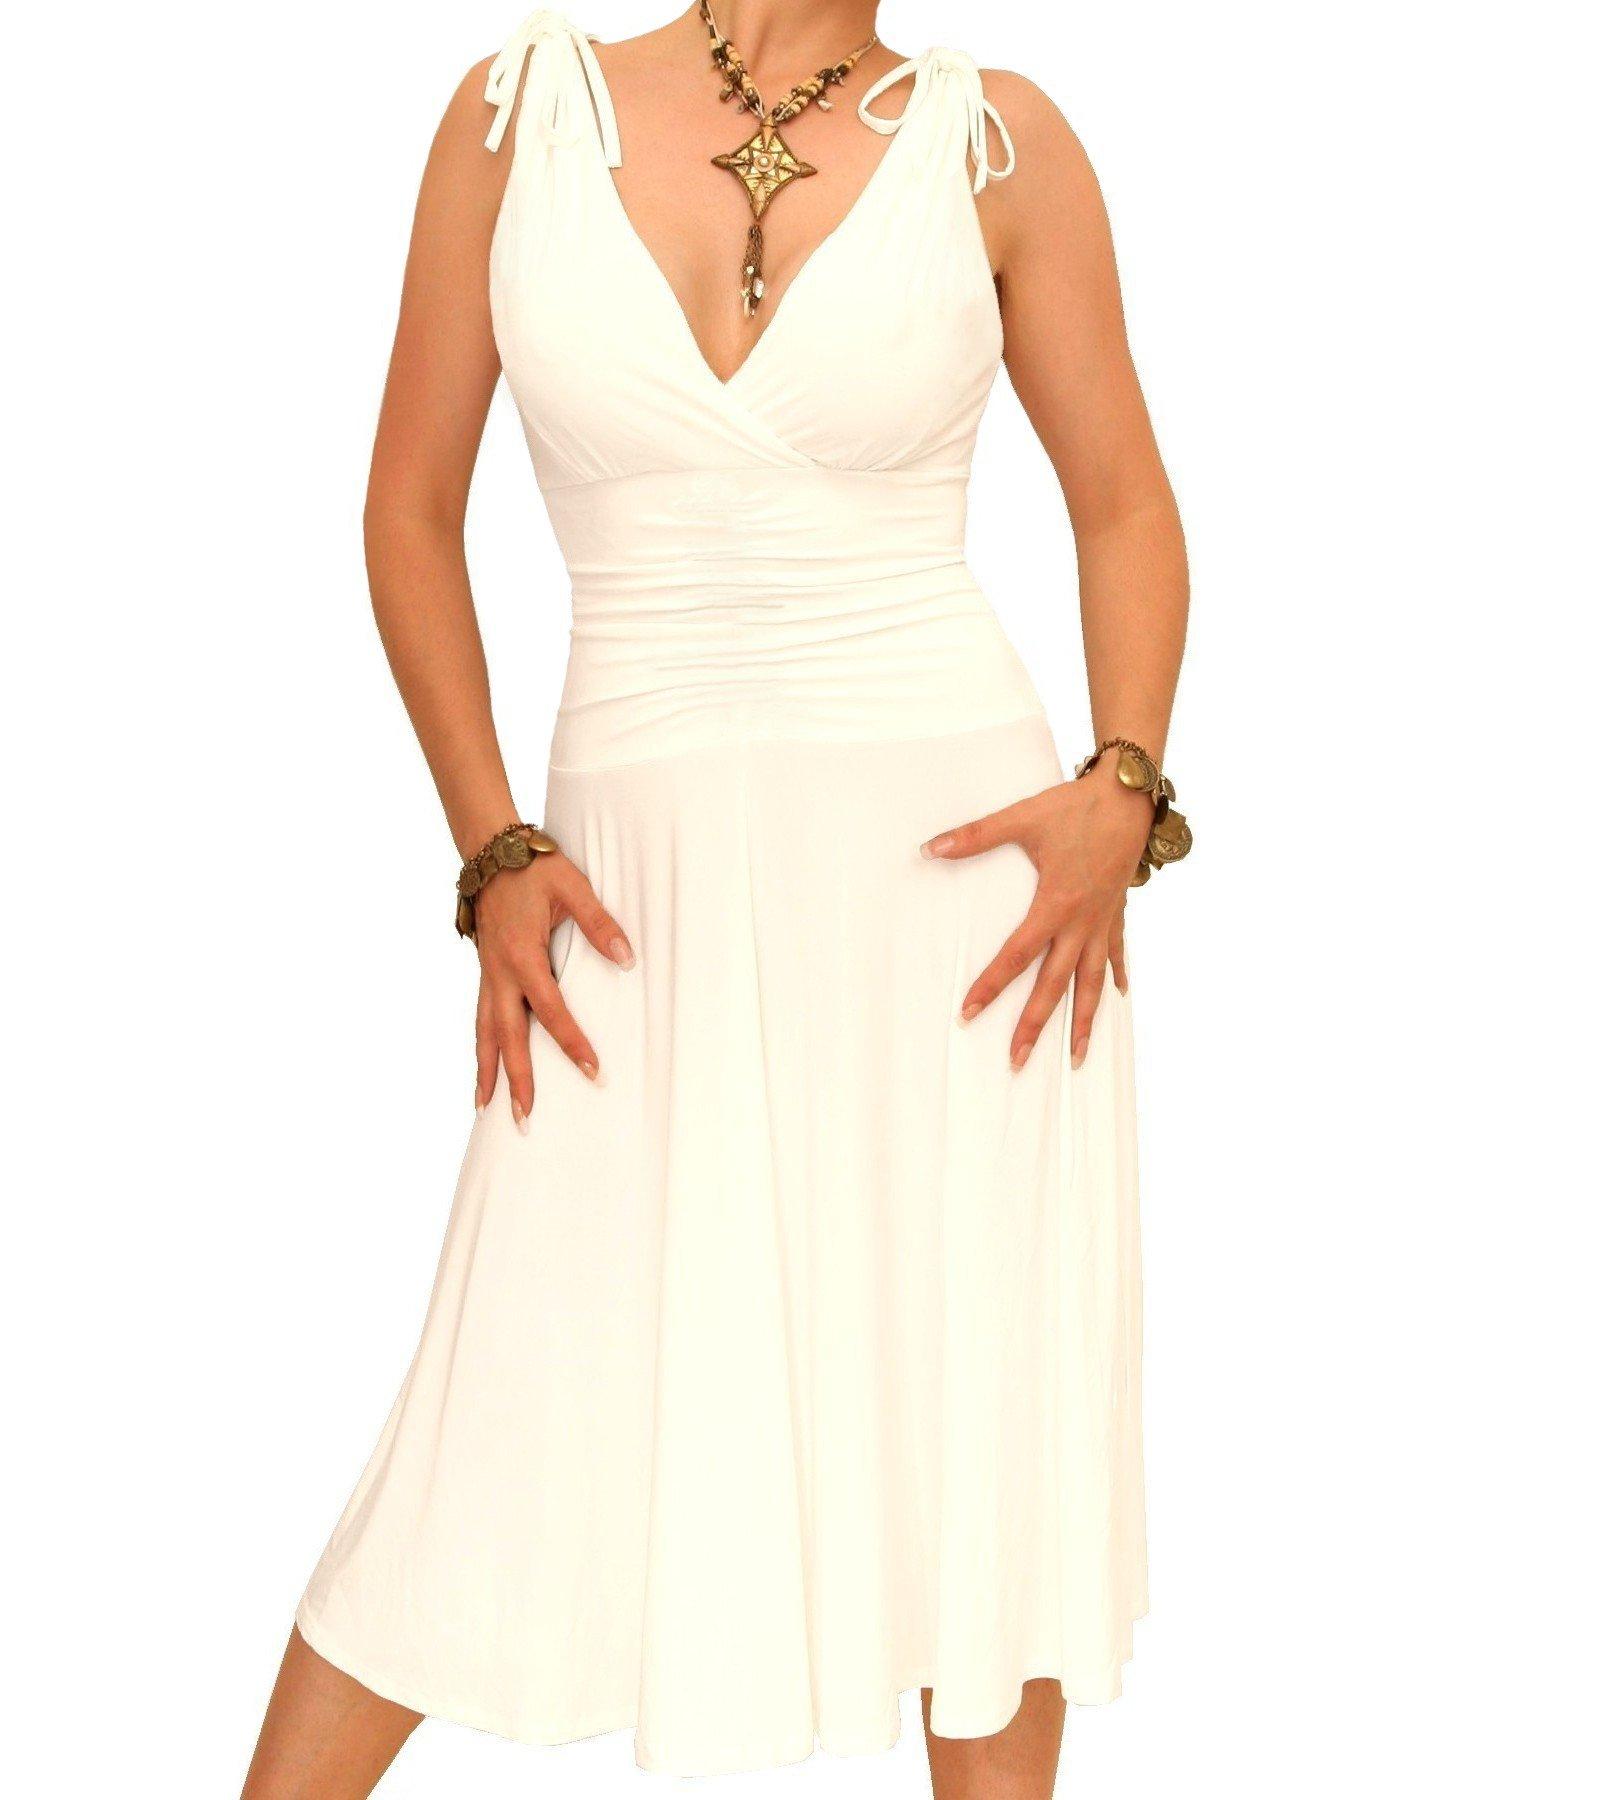 Blue Banana Women's Grecian Style Slinky Dress Ivory US Size 14